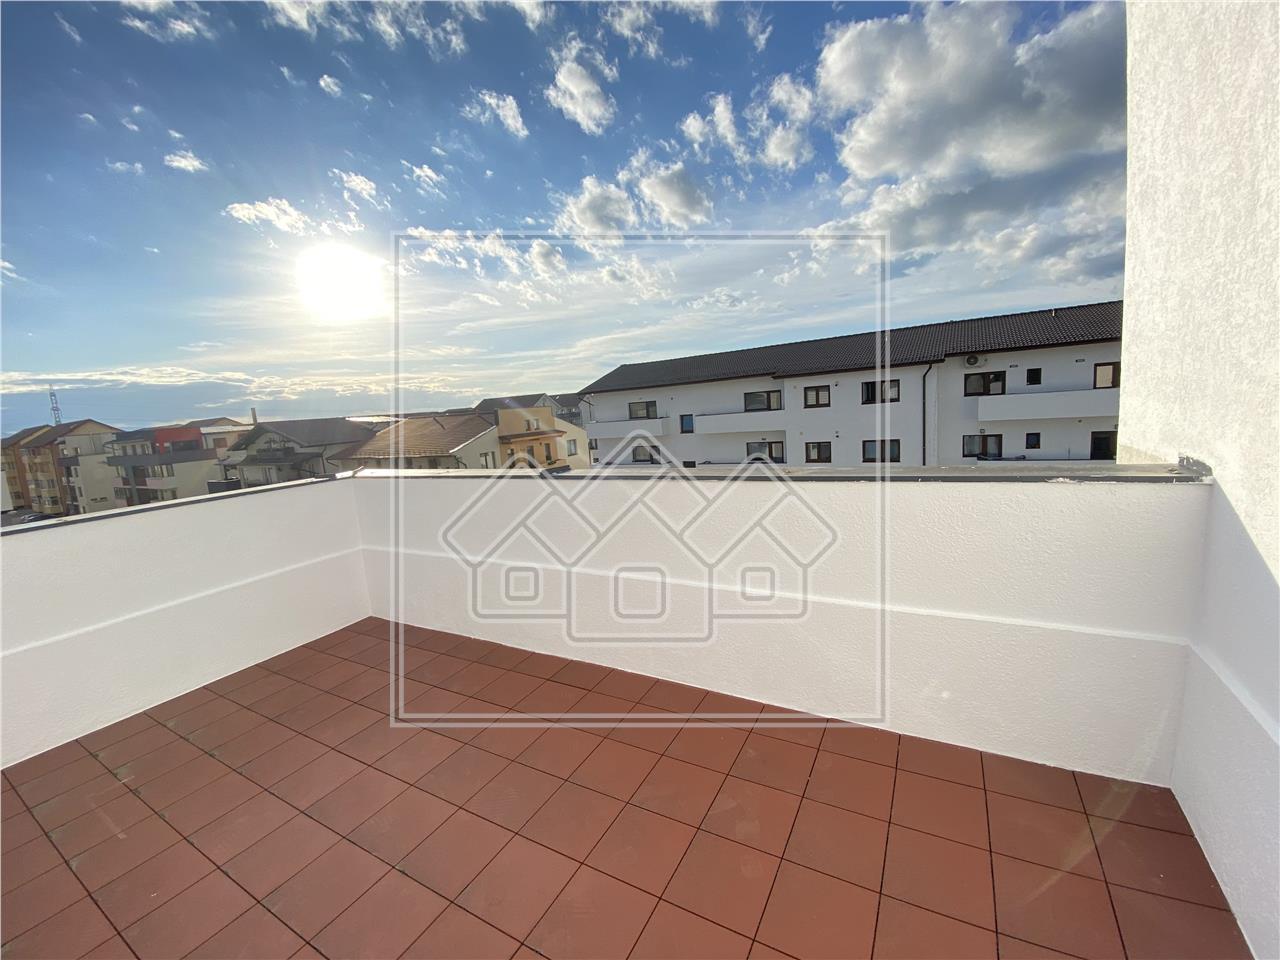 Penthouse de vanzare in Sibiu - mobilat si utilat modern -67 mp terasa